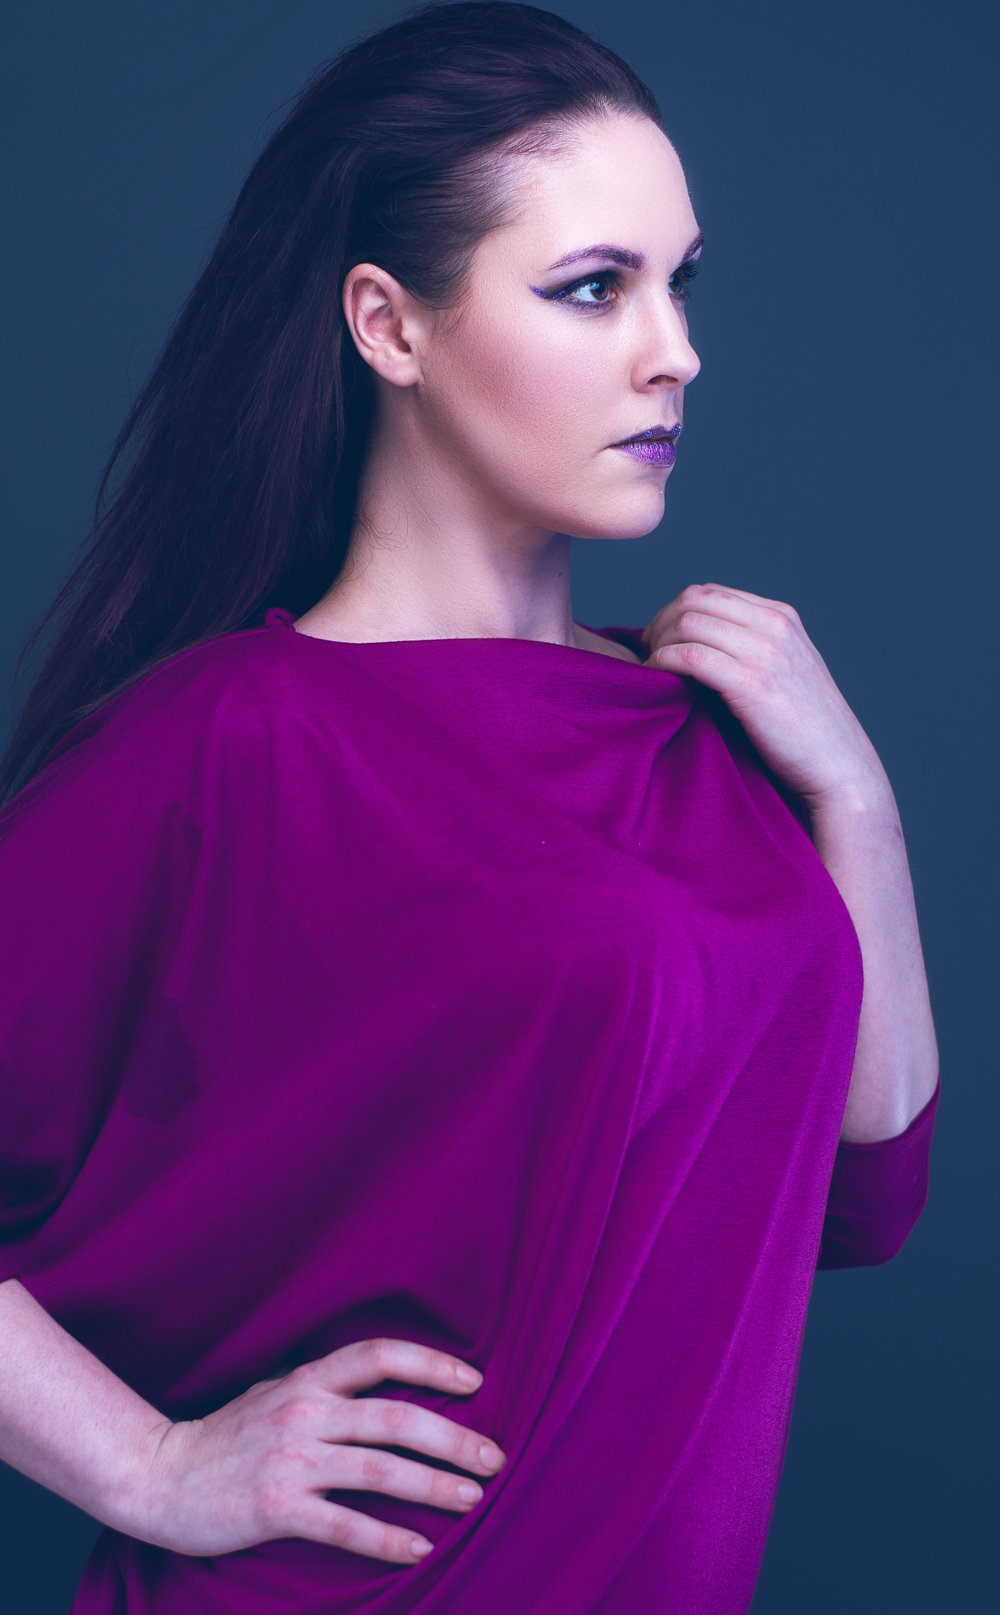 zaramia-ava-zaramiaava-leeds-fashion-designer-ethical-sustainable-minimalist-ayaka-magenta-dress-versatile-drape-cowl-styling-studio-womenswear-models-photoshoot-vibrant-colour-4